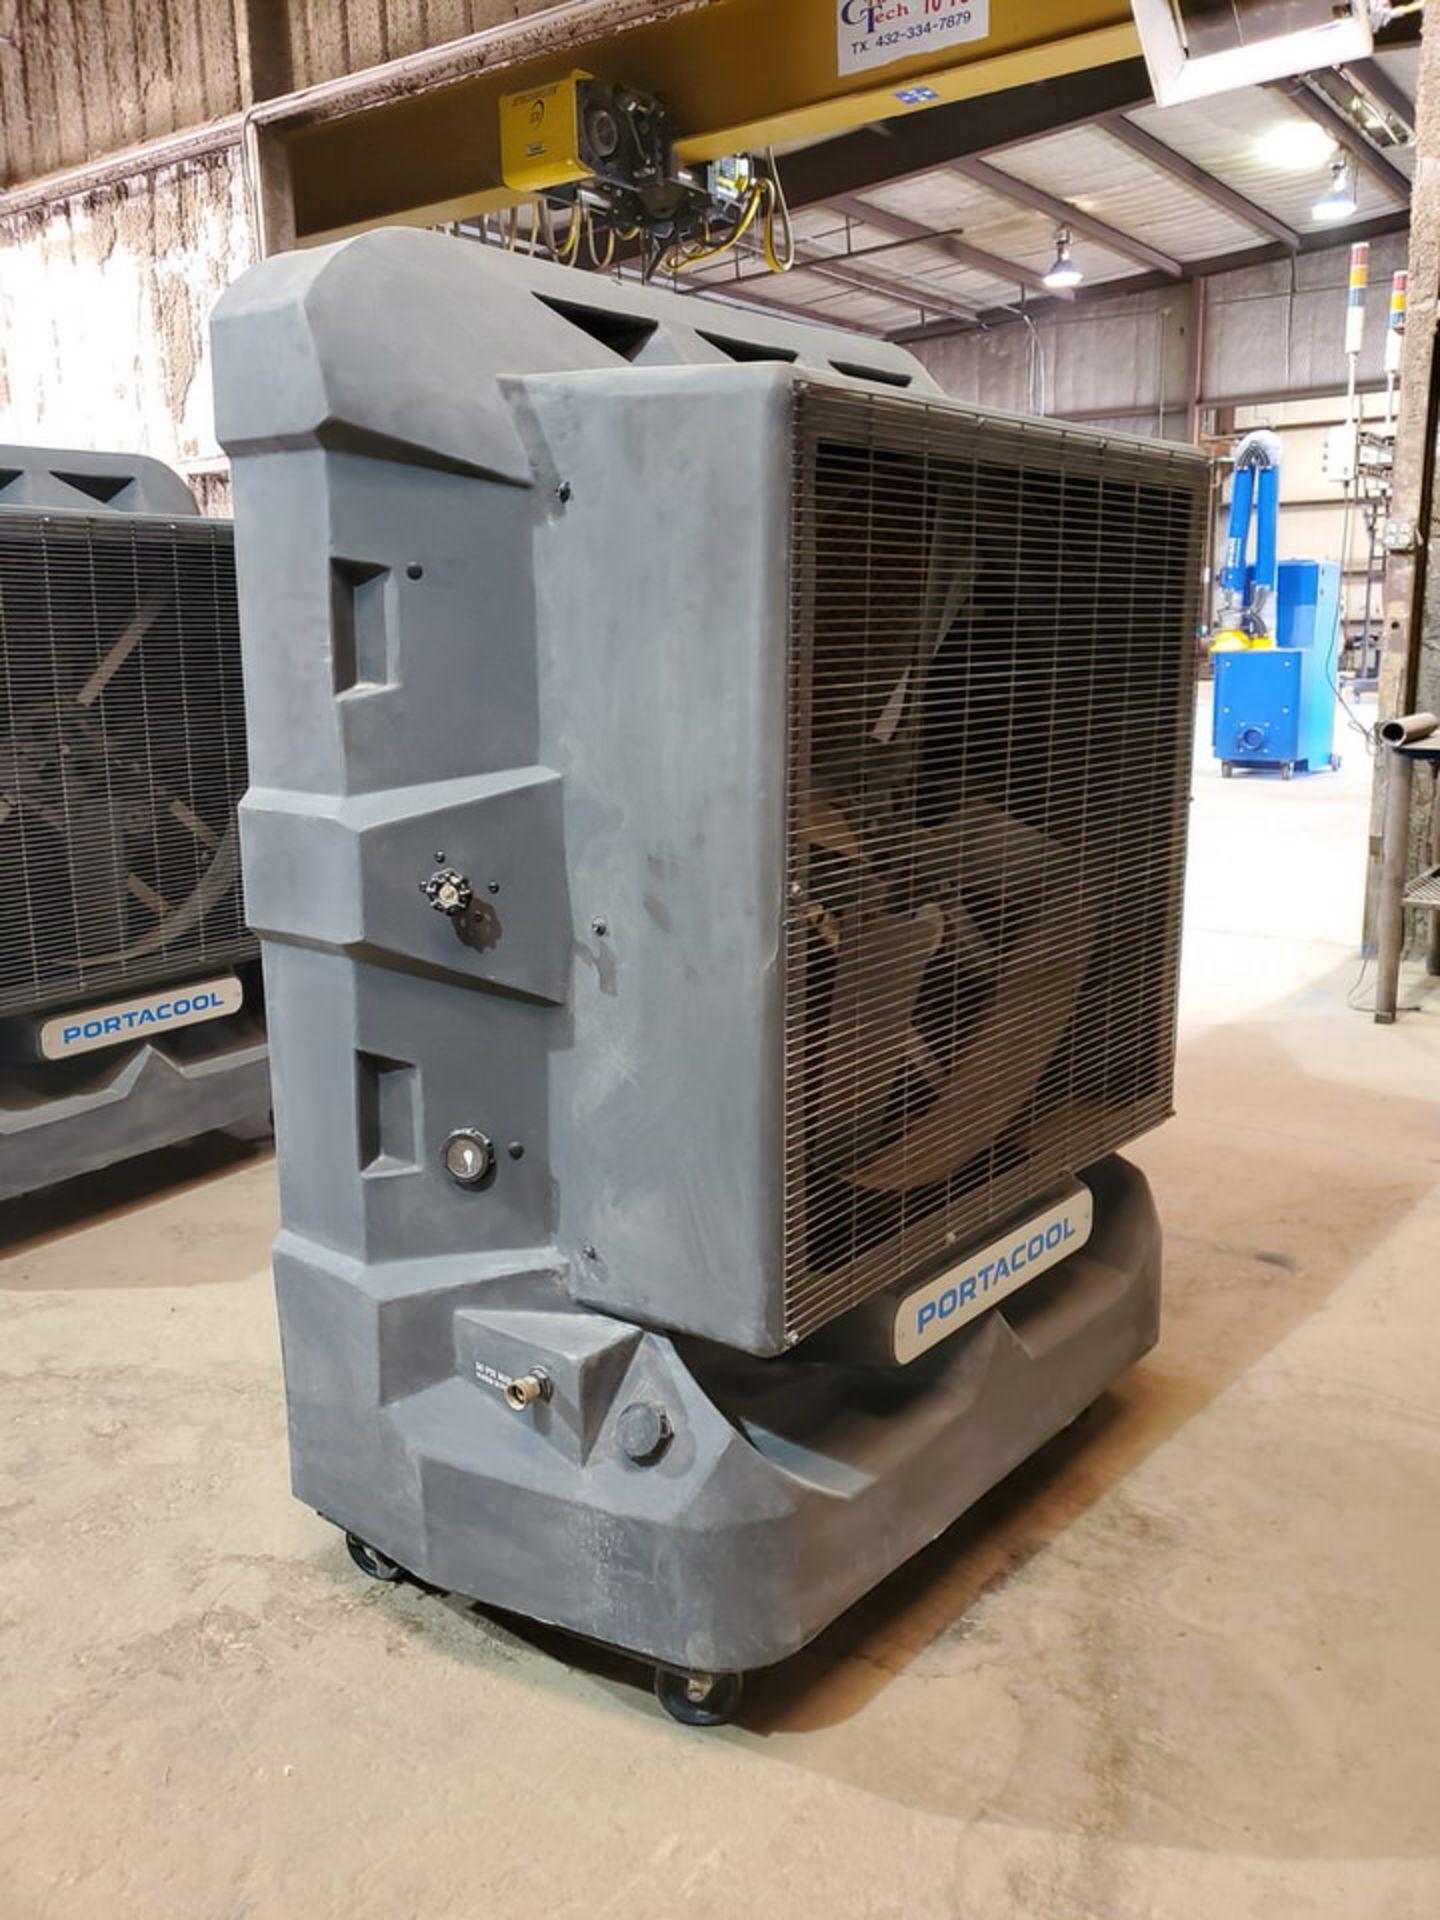 Portacool Cyclone 160 Portable Evaporative Cooler 115V, 60HZ, 7.3A - Image 3 of 7